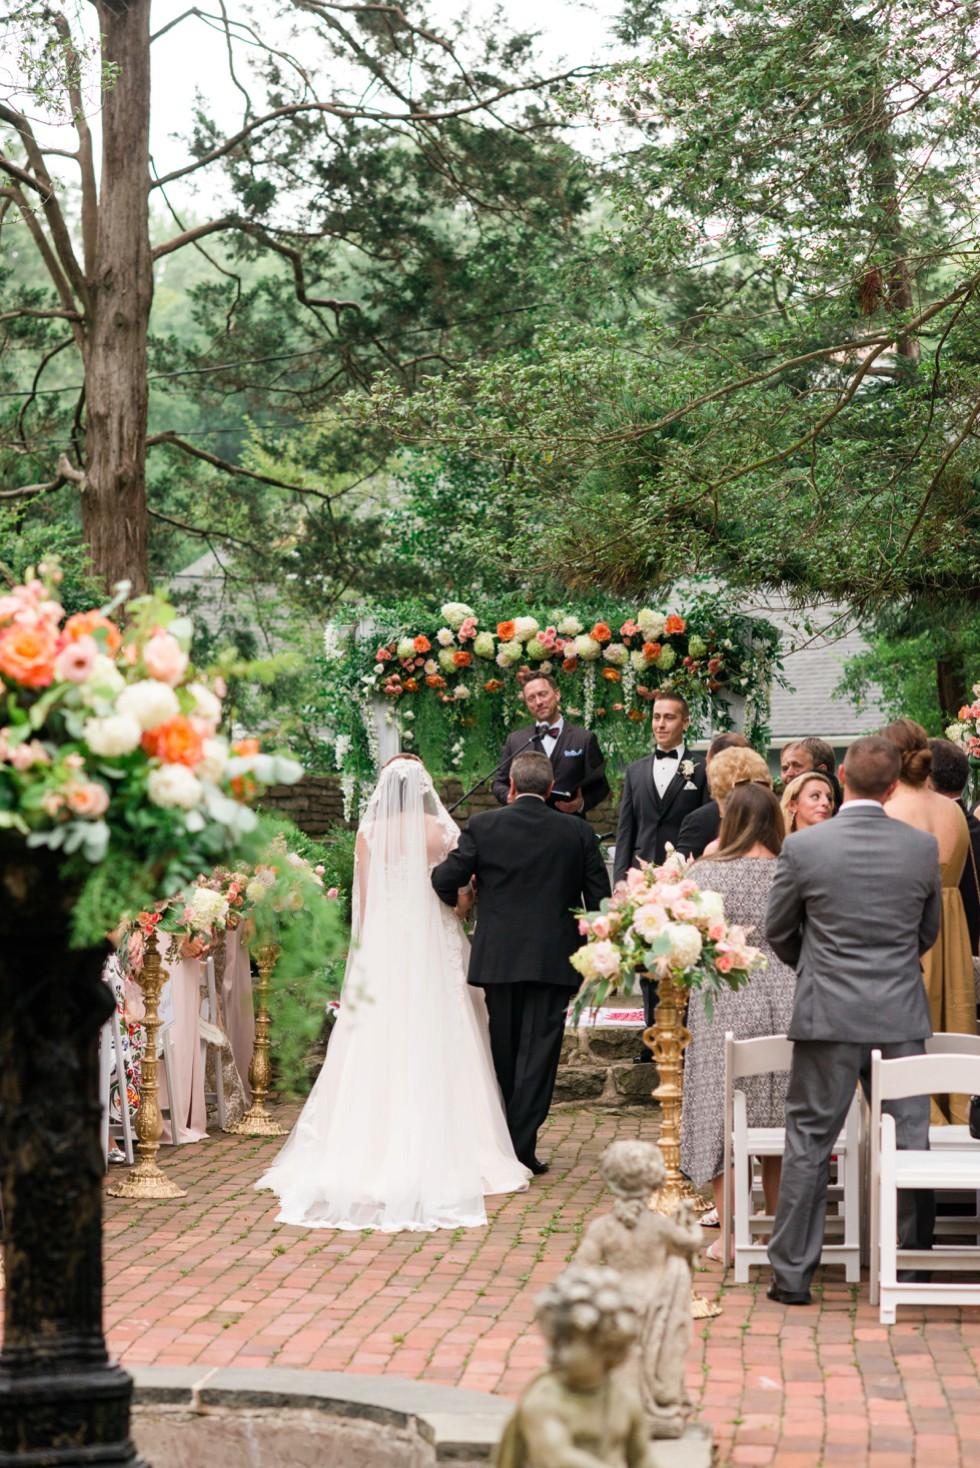 Holly Hedge estate outdoor wedding ceremony